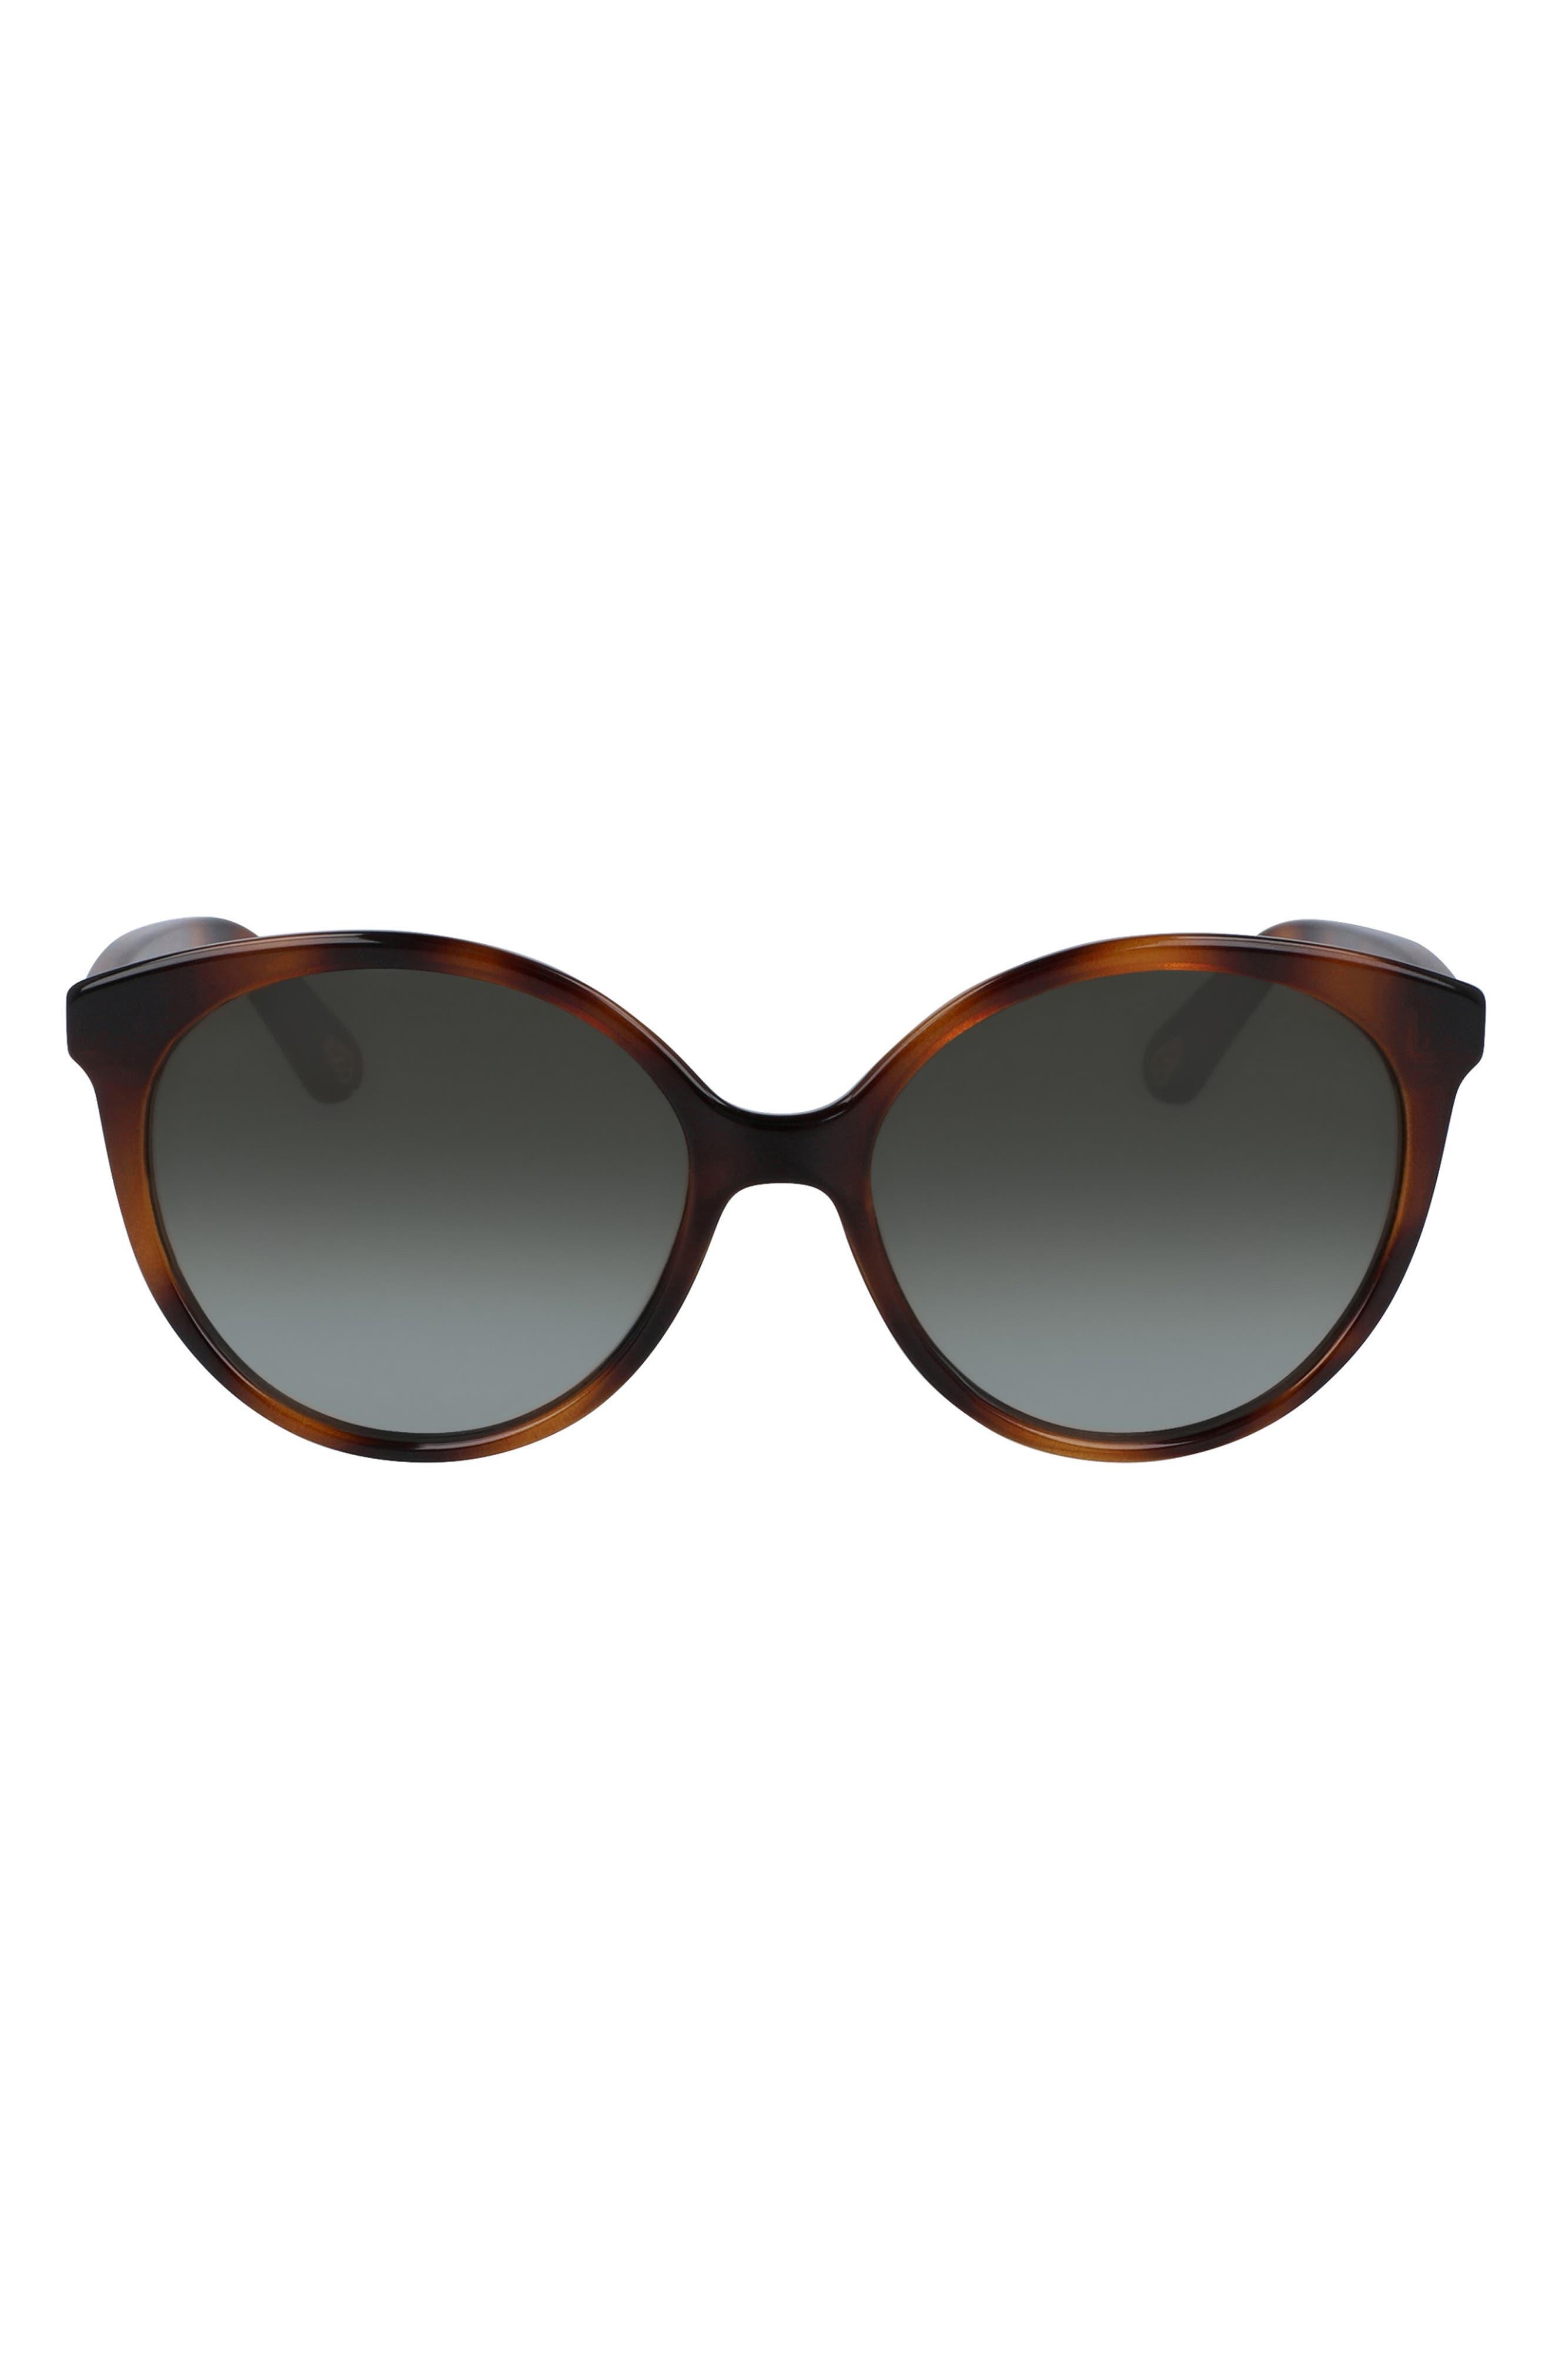 Image of Chloe 58mm Classic Rounded Cat Eye Sunglasses